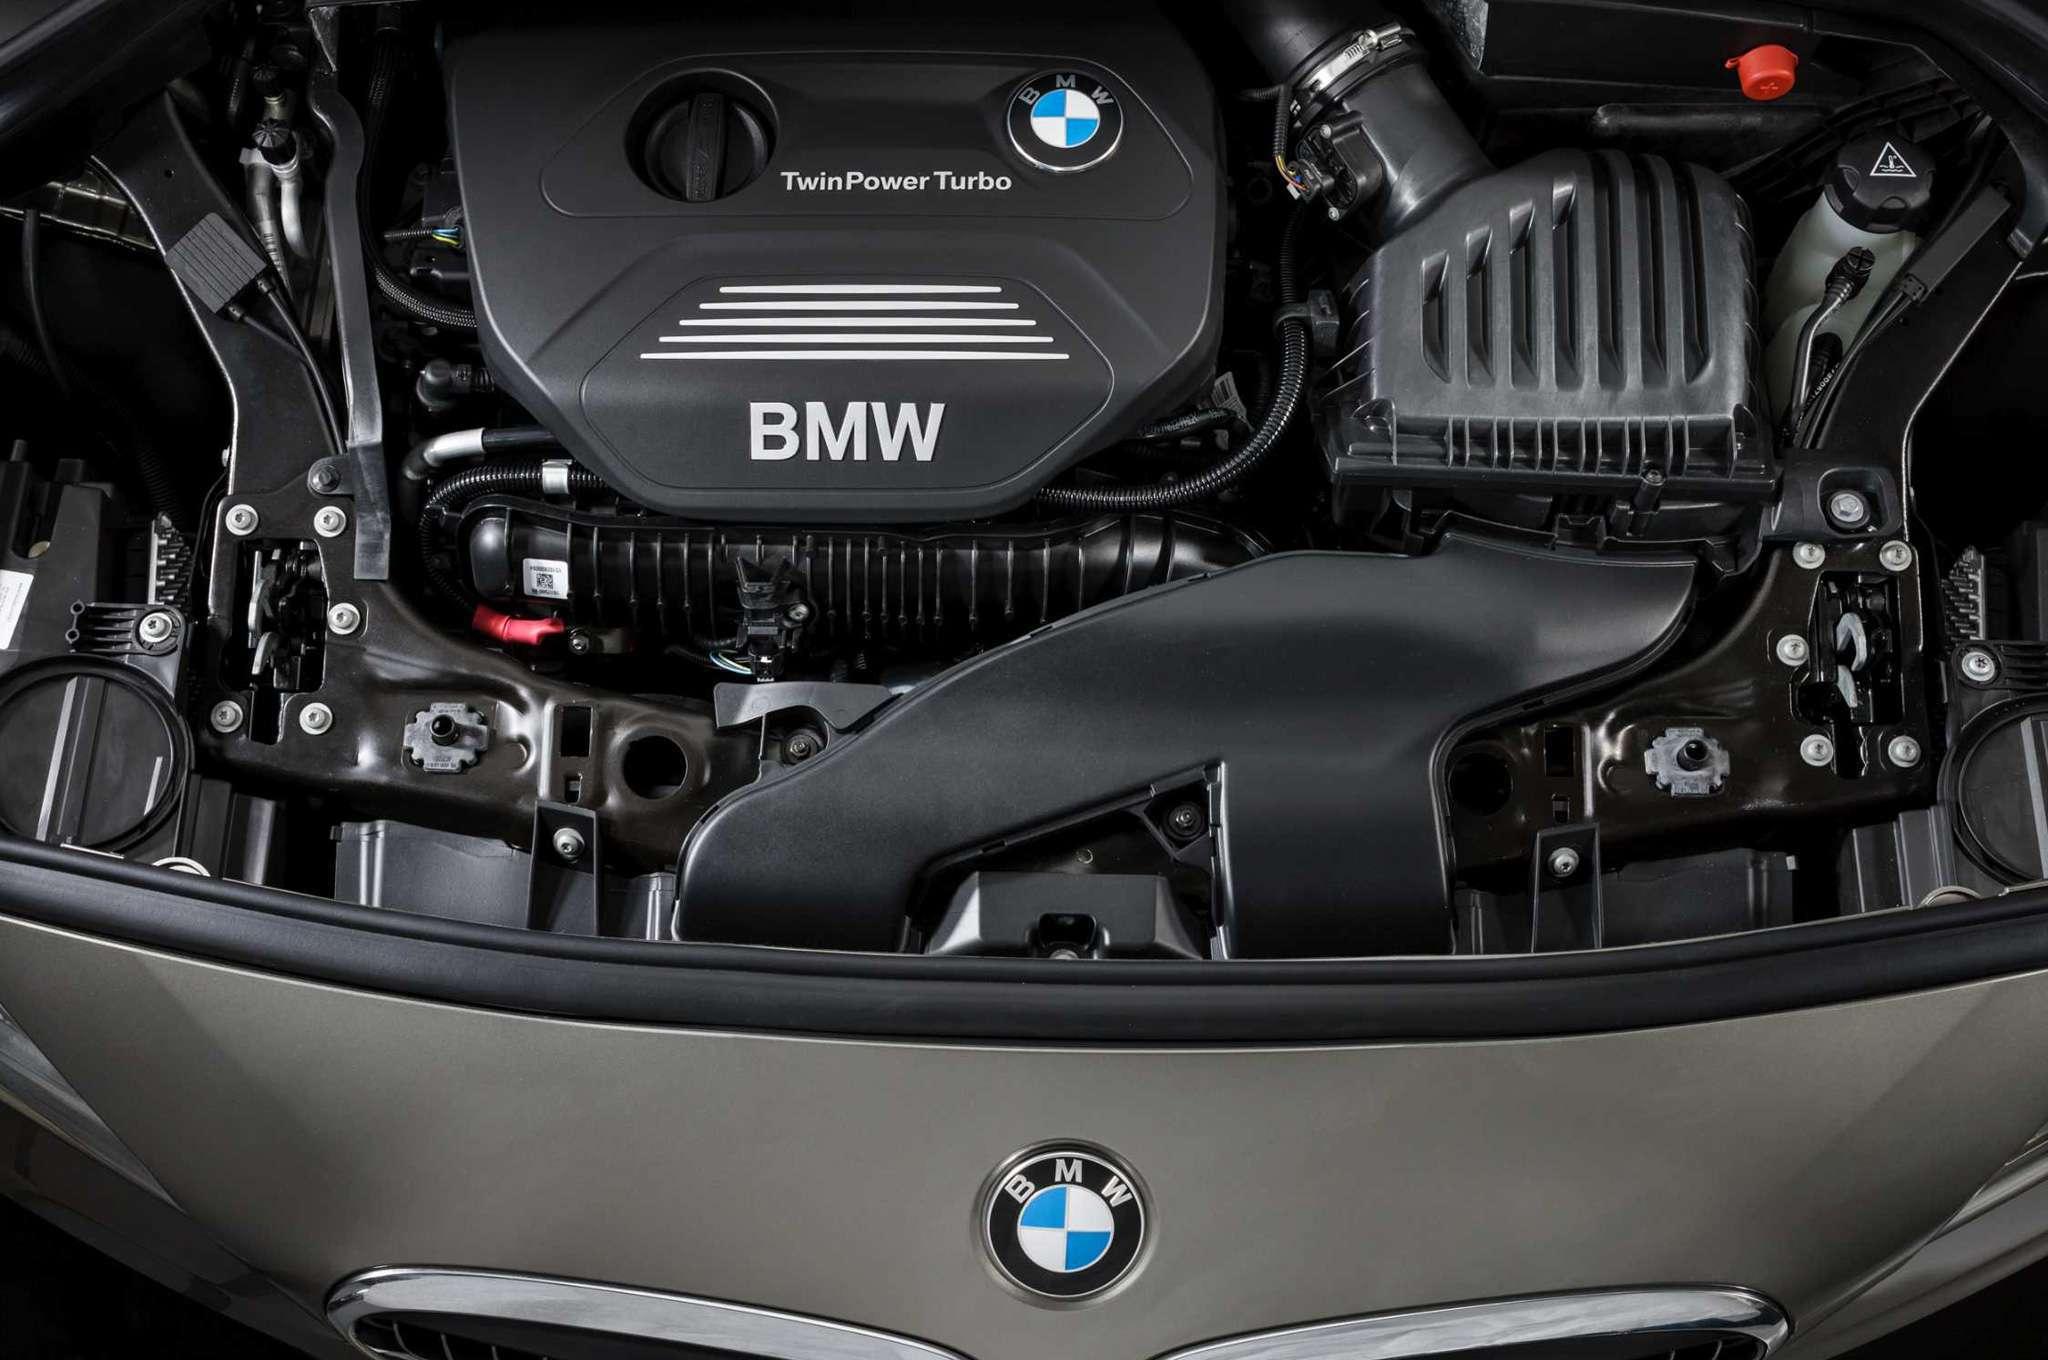 2016 BMW 2 Series Active Tourer 225i TwinPower Turbo Engine